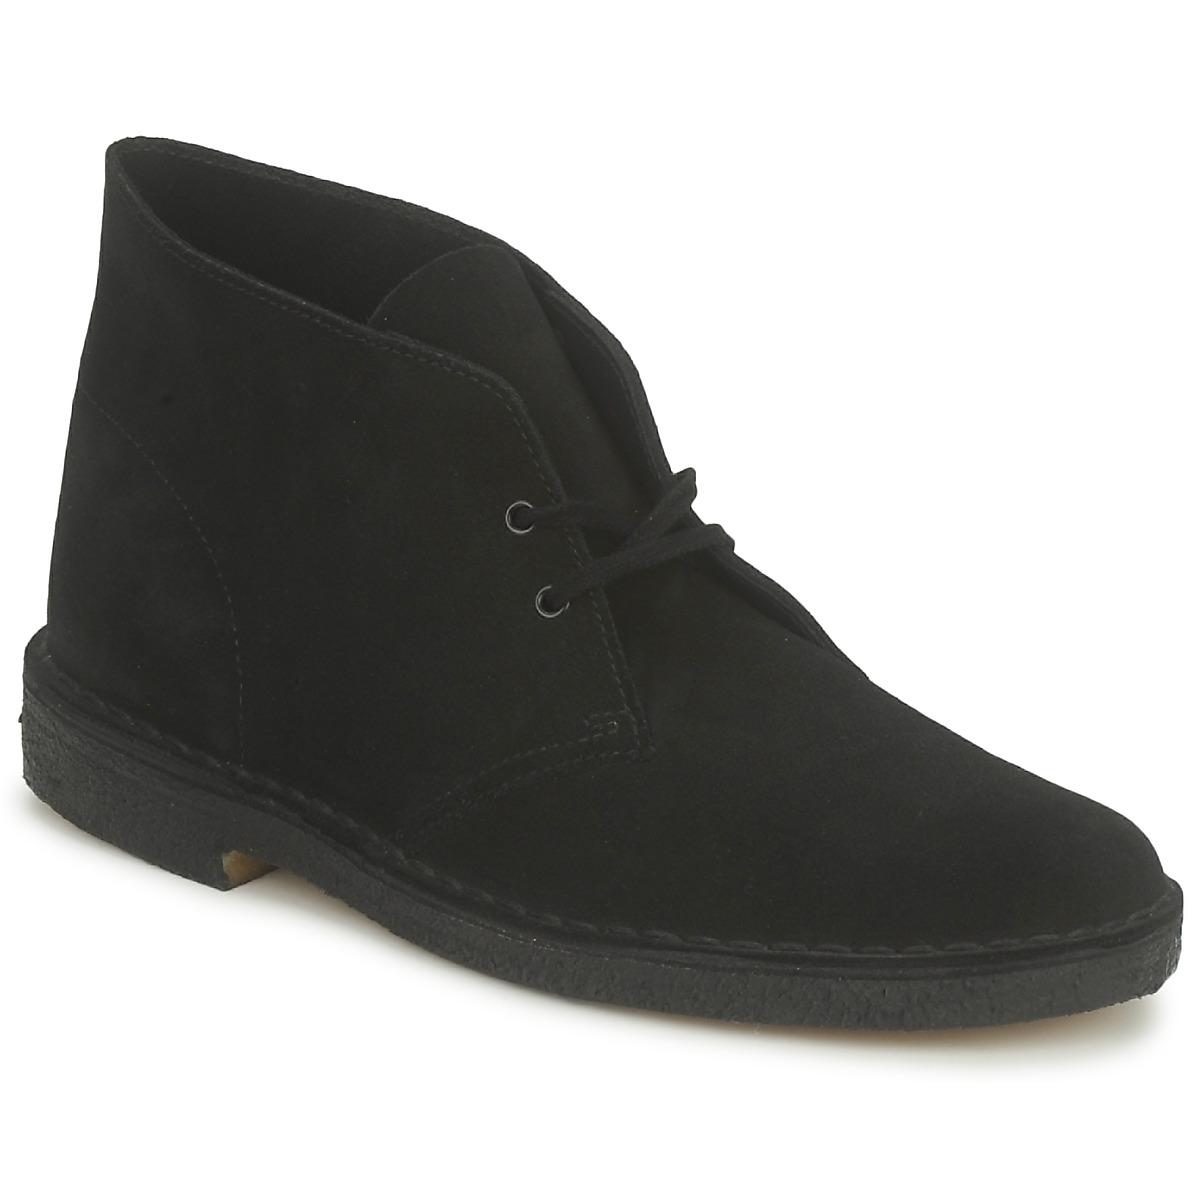 Clarks DESERT BOOT Noir - Livraison Gratuite avec Spartoo.com ! -  Chaussures Boot Homme 107,00 €